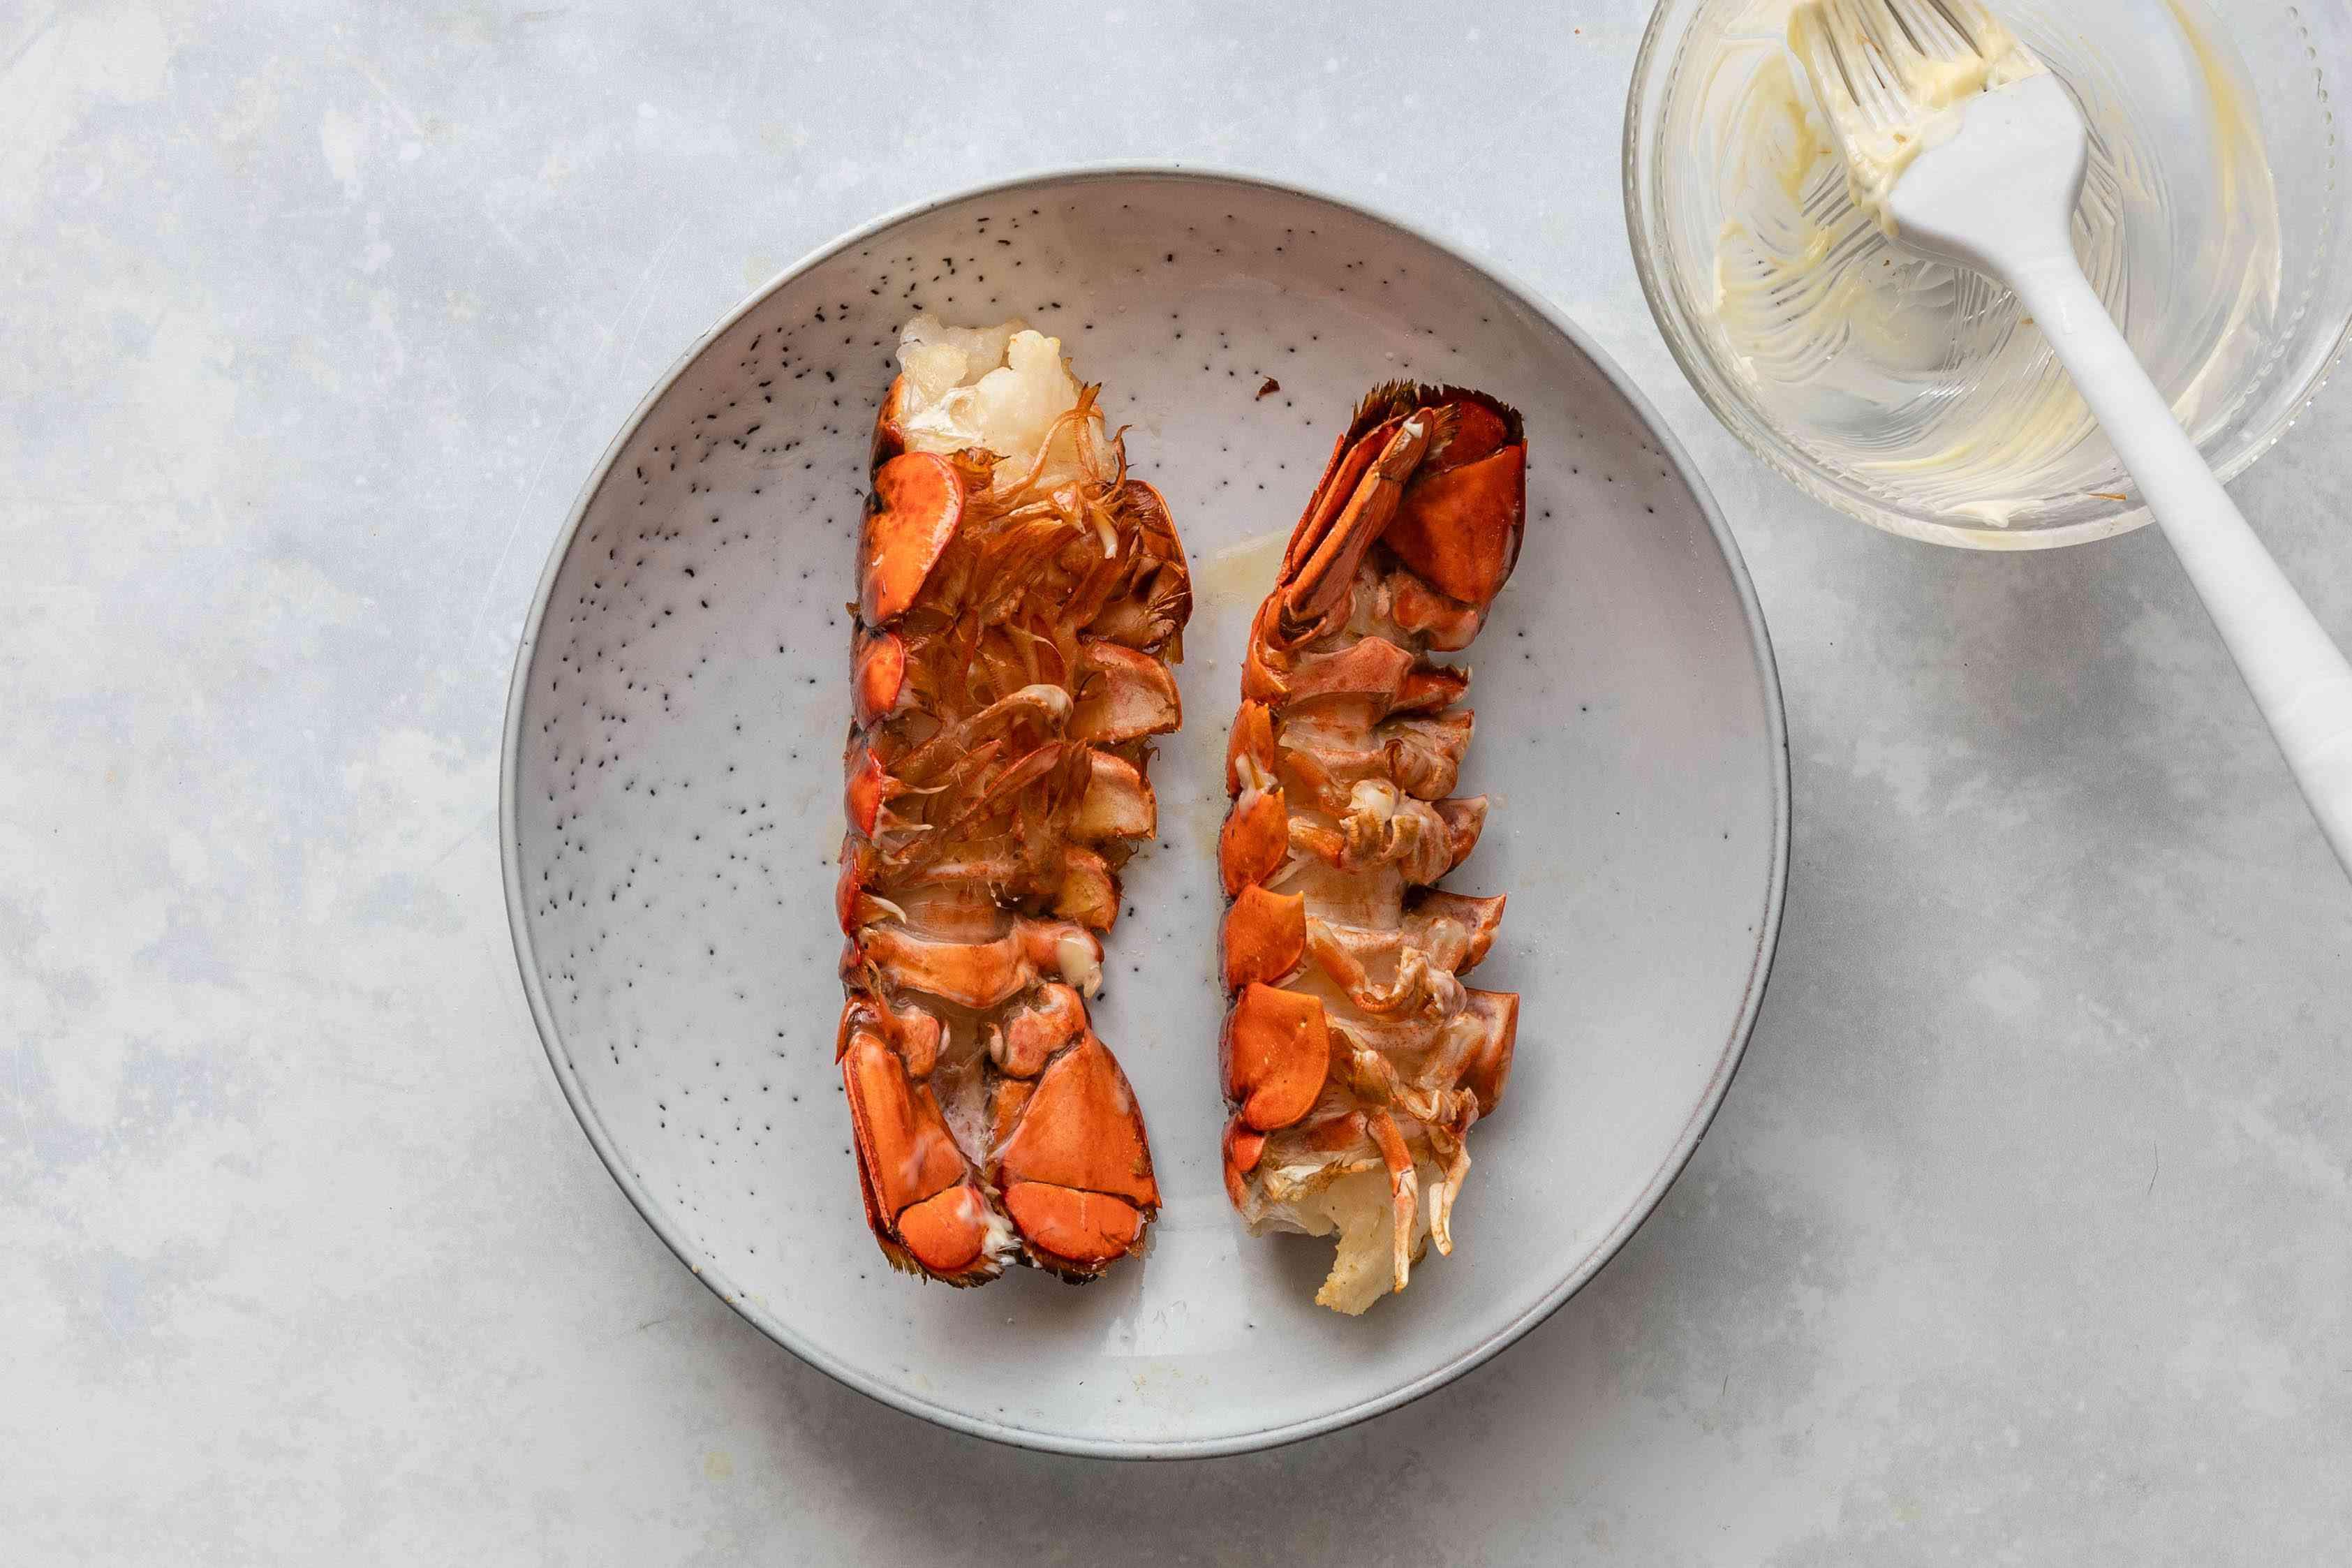 Bake lobster